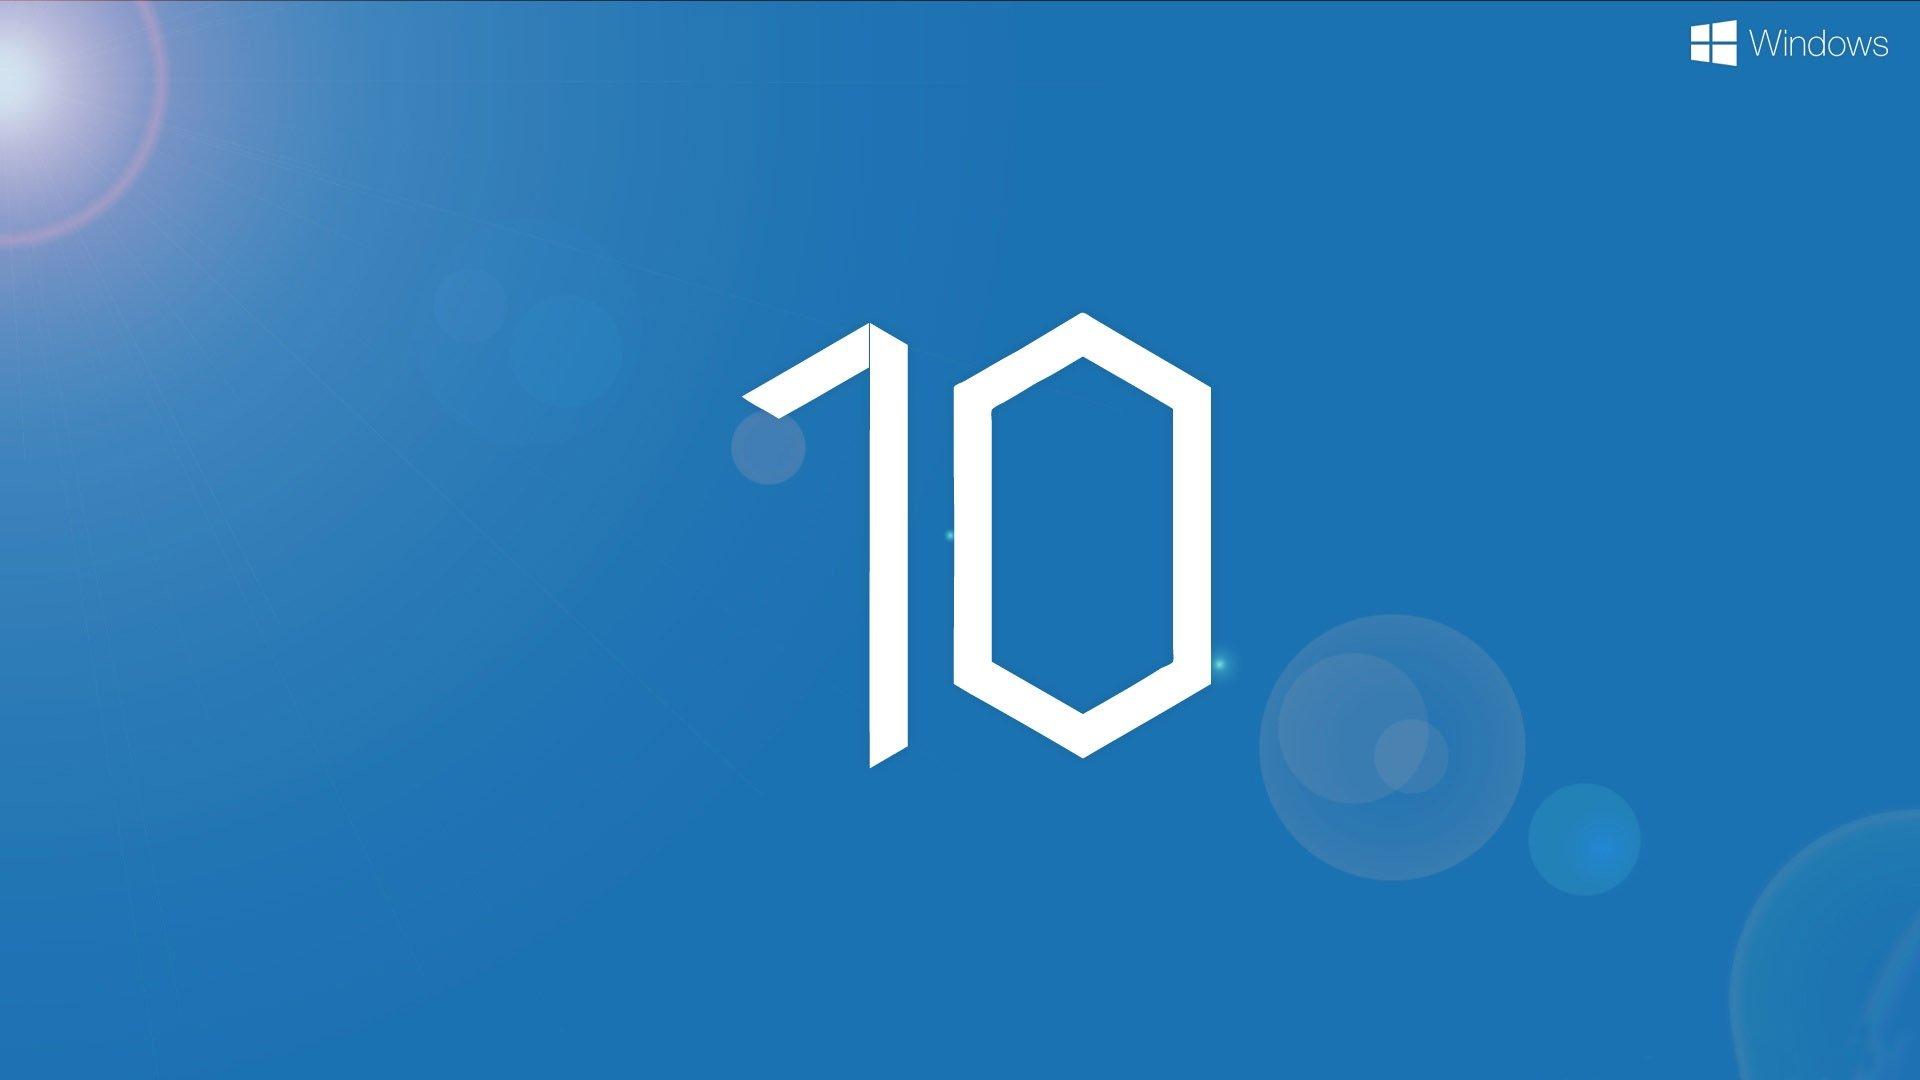 windows 10, microsoft, os, логотип, десятка, hd